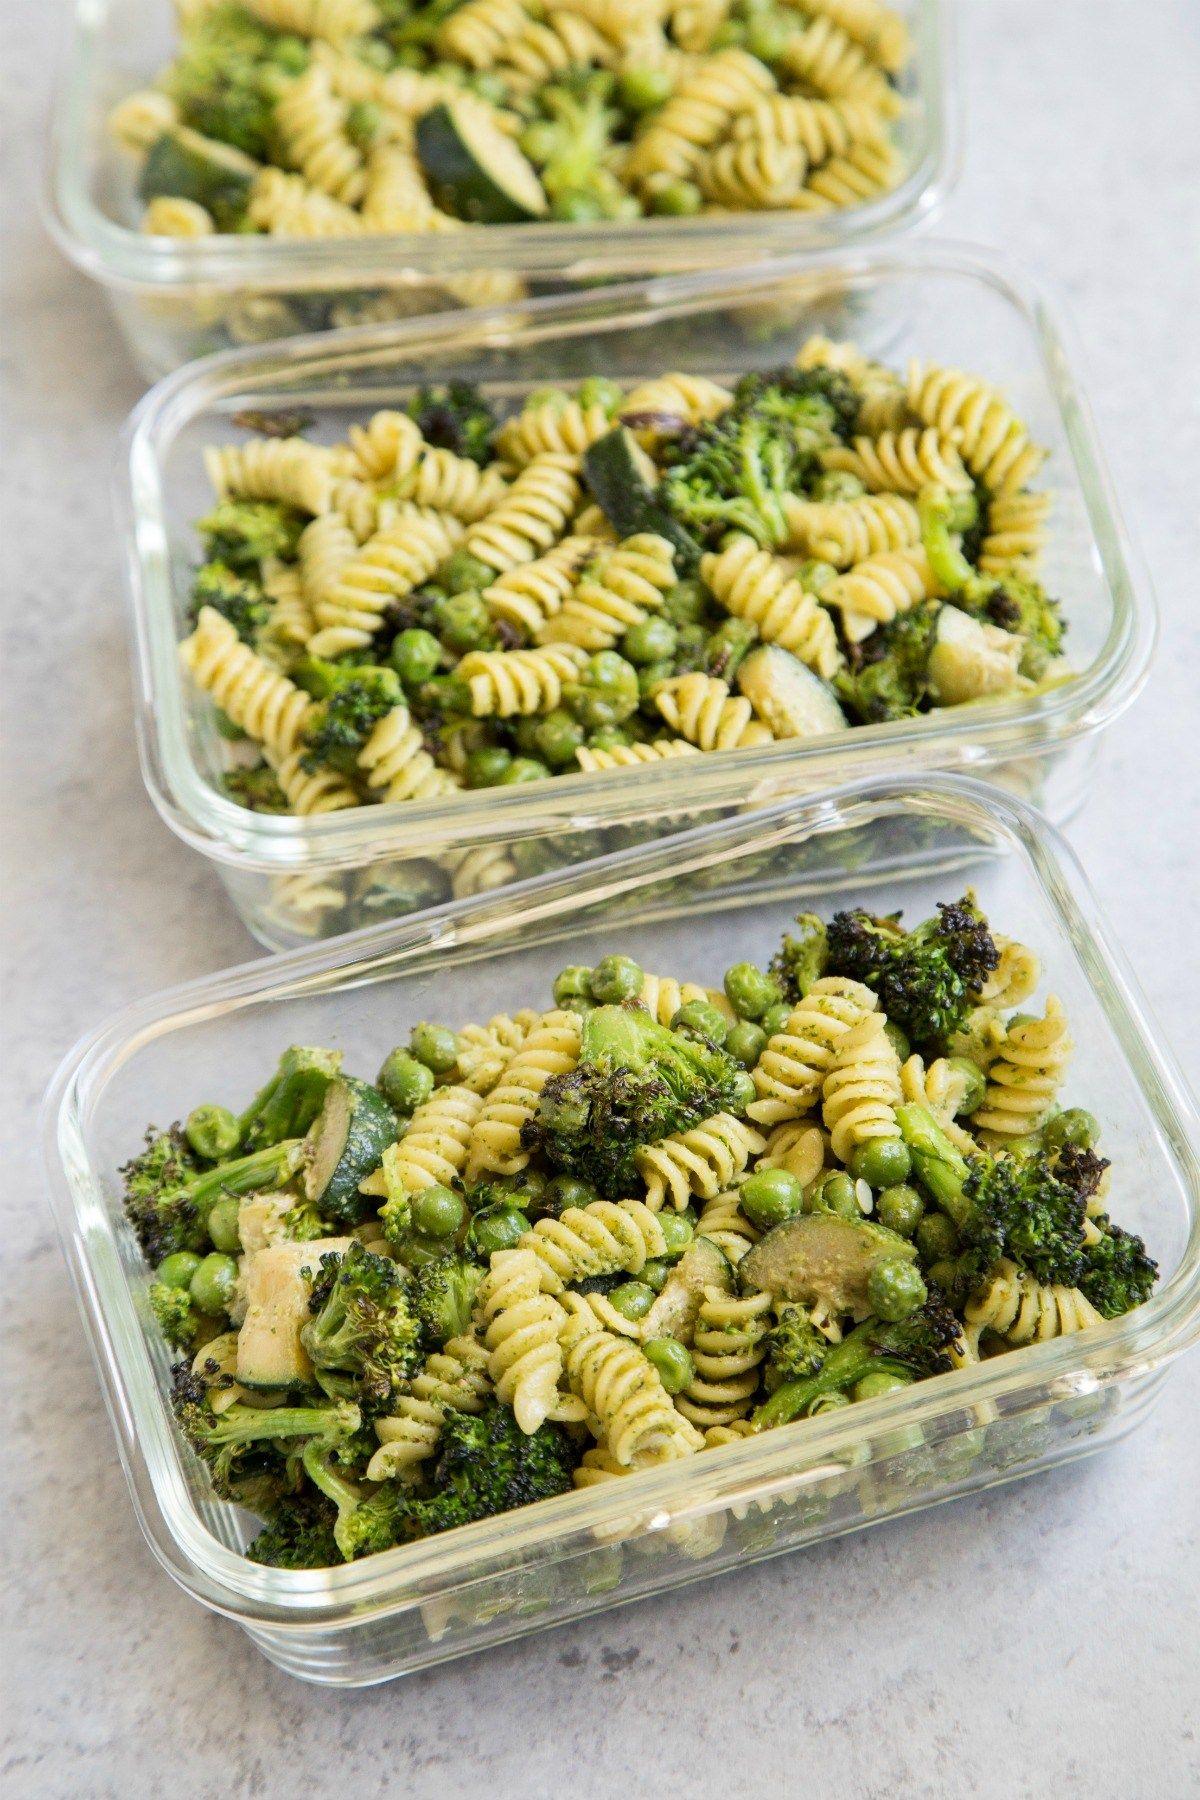 Arugula Pesto Pasta Meal Prep Recipe Vegetarian Meal Prep Vegetarian Lunch Healthy Meal Prep